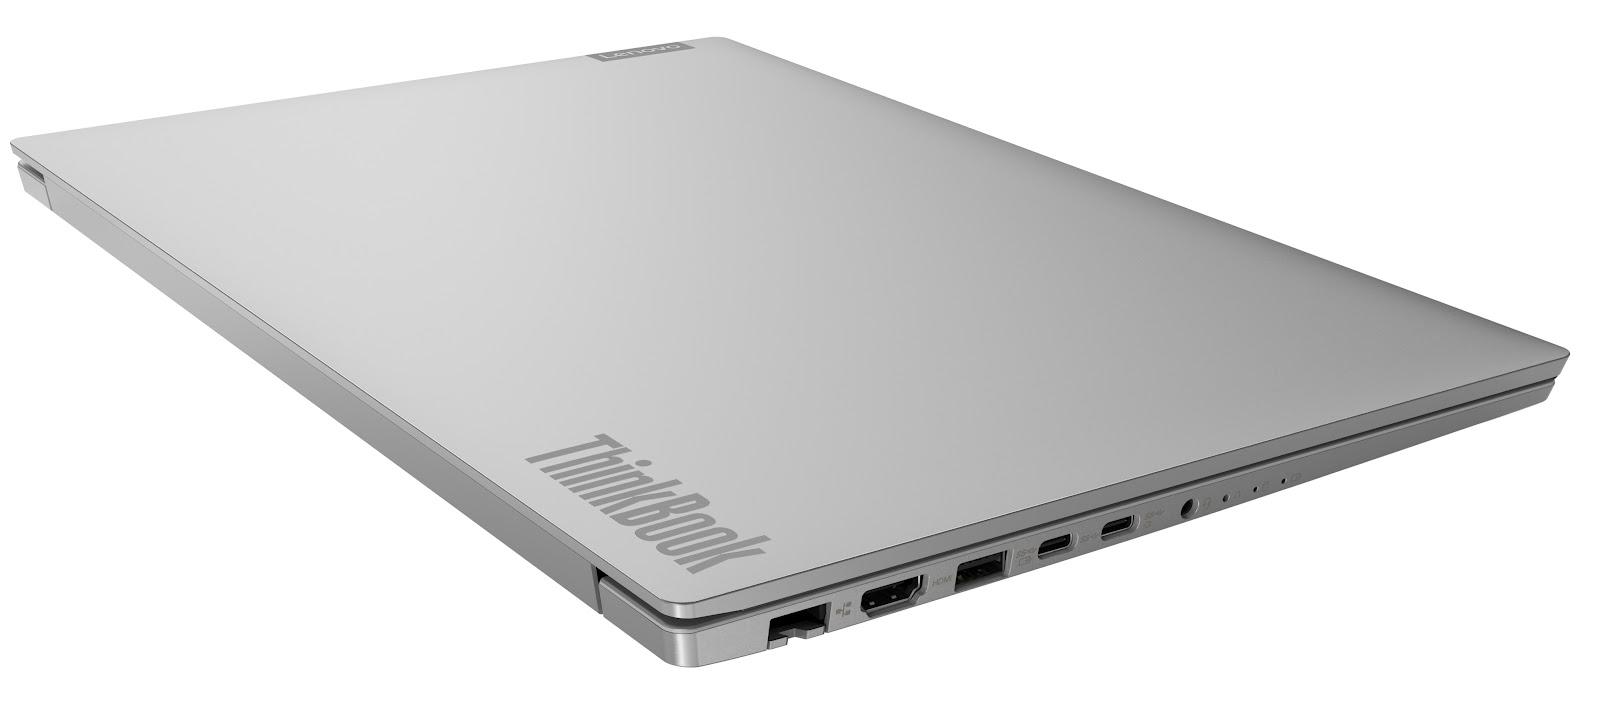 Фото 3. Ноутбук Lenovo ThinkBook 15-IIL (20SM003VRU)